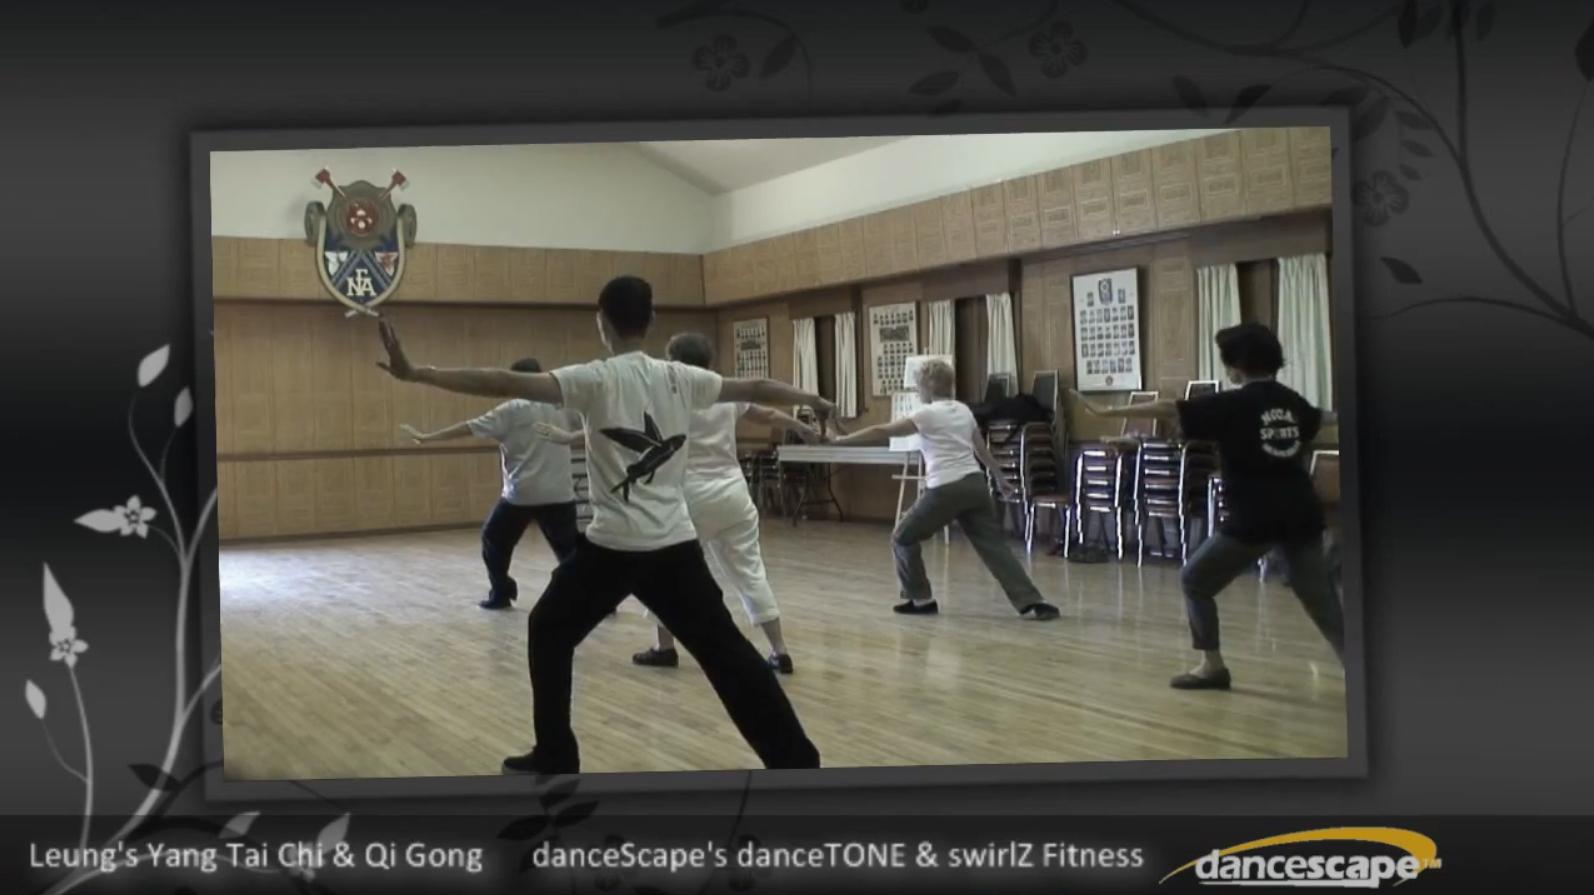 danceScape Tai Chi (Yang Style), Qi Gong, danceTONE & swirlZ Fitness